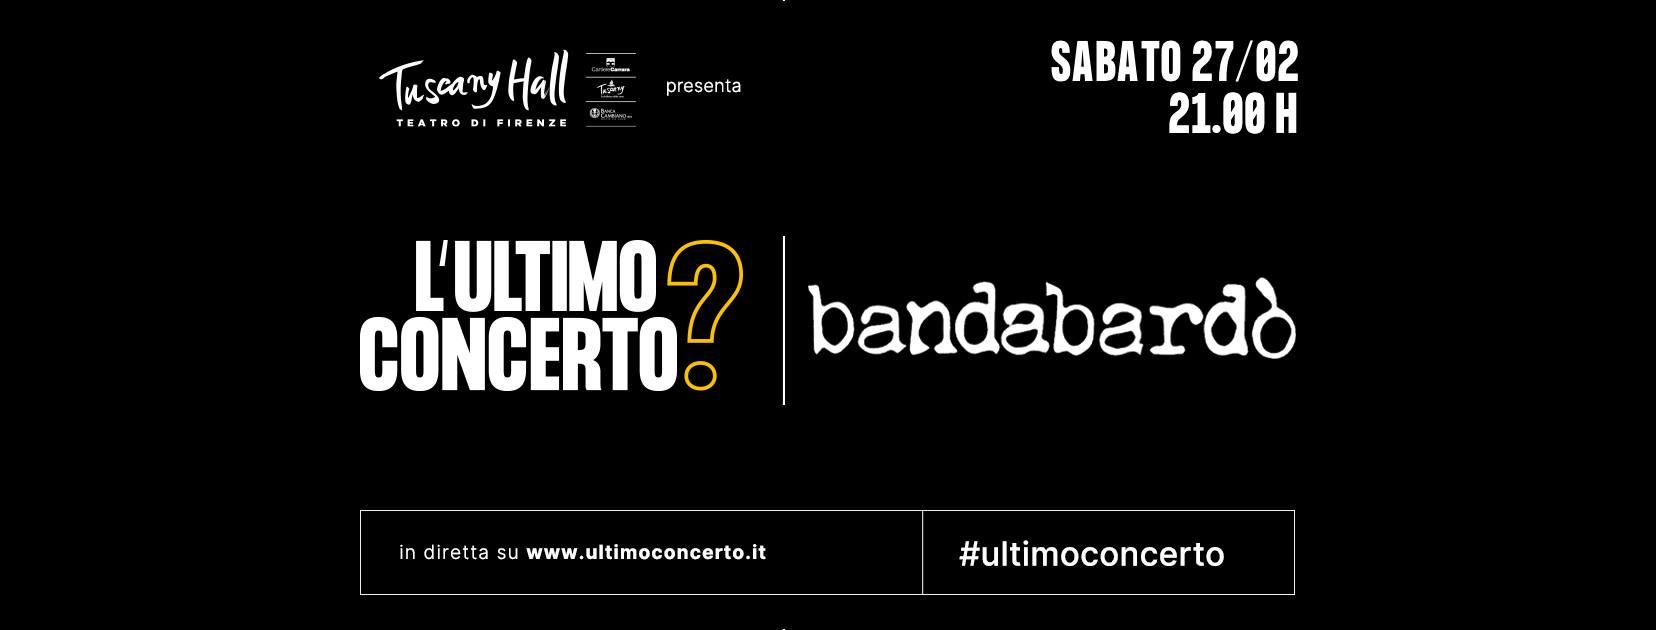 Bandabardò, L'Ultimo Concerto? Tuscany Hall di Firenze